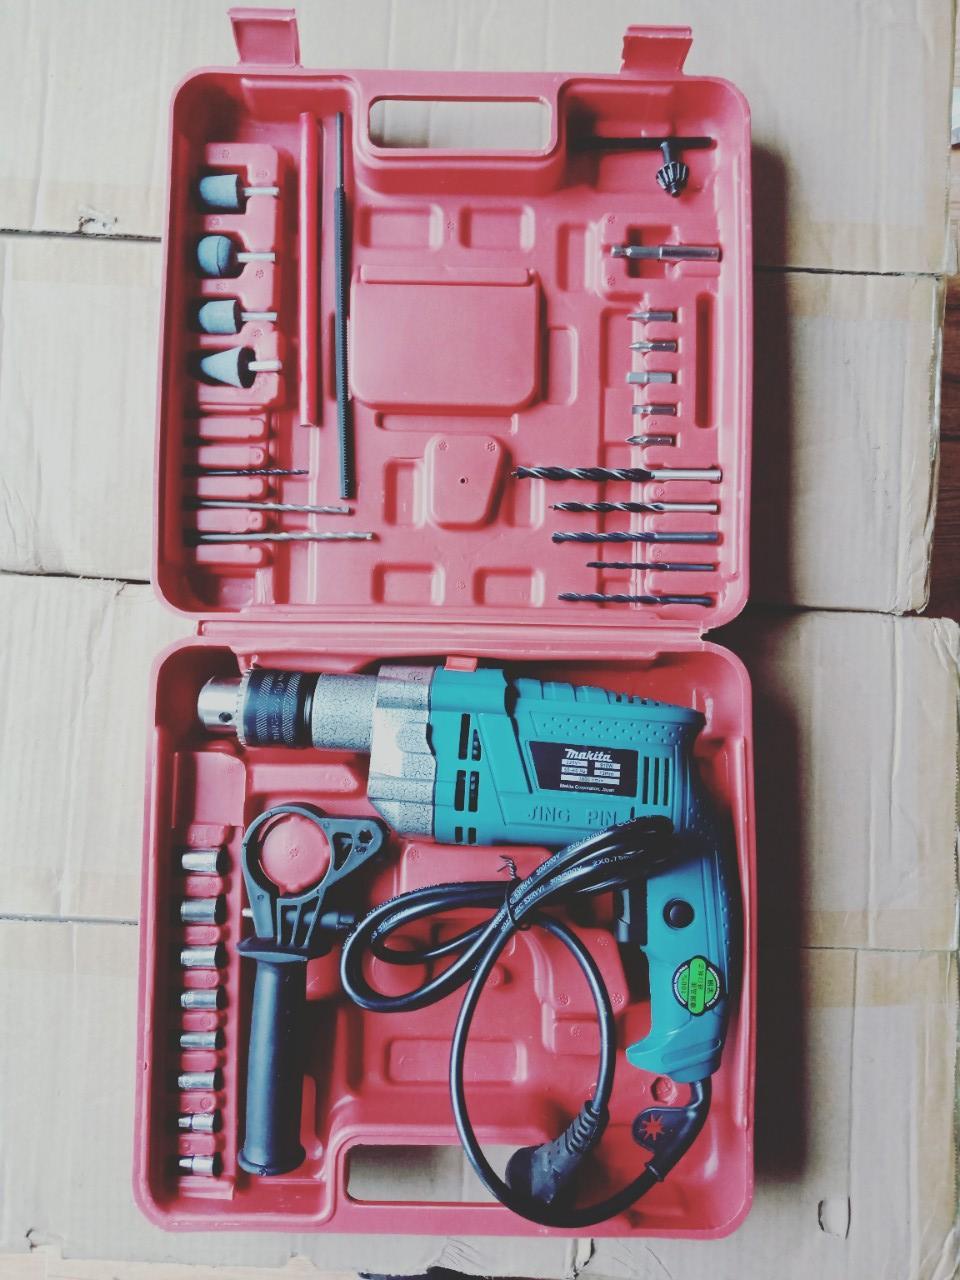 Máy khoan makita 910w | MAY KHOAN | May khoan cam tay | máy khoan giá rẻ